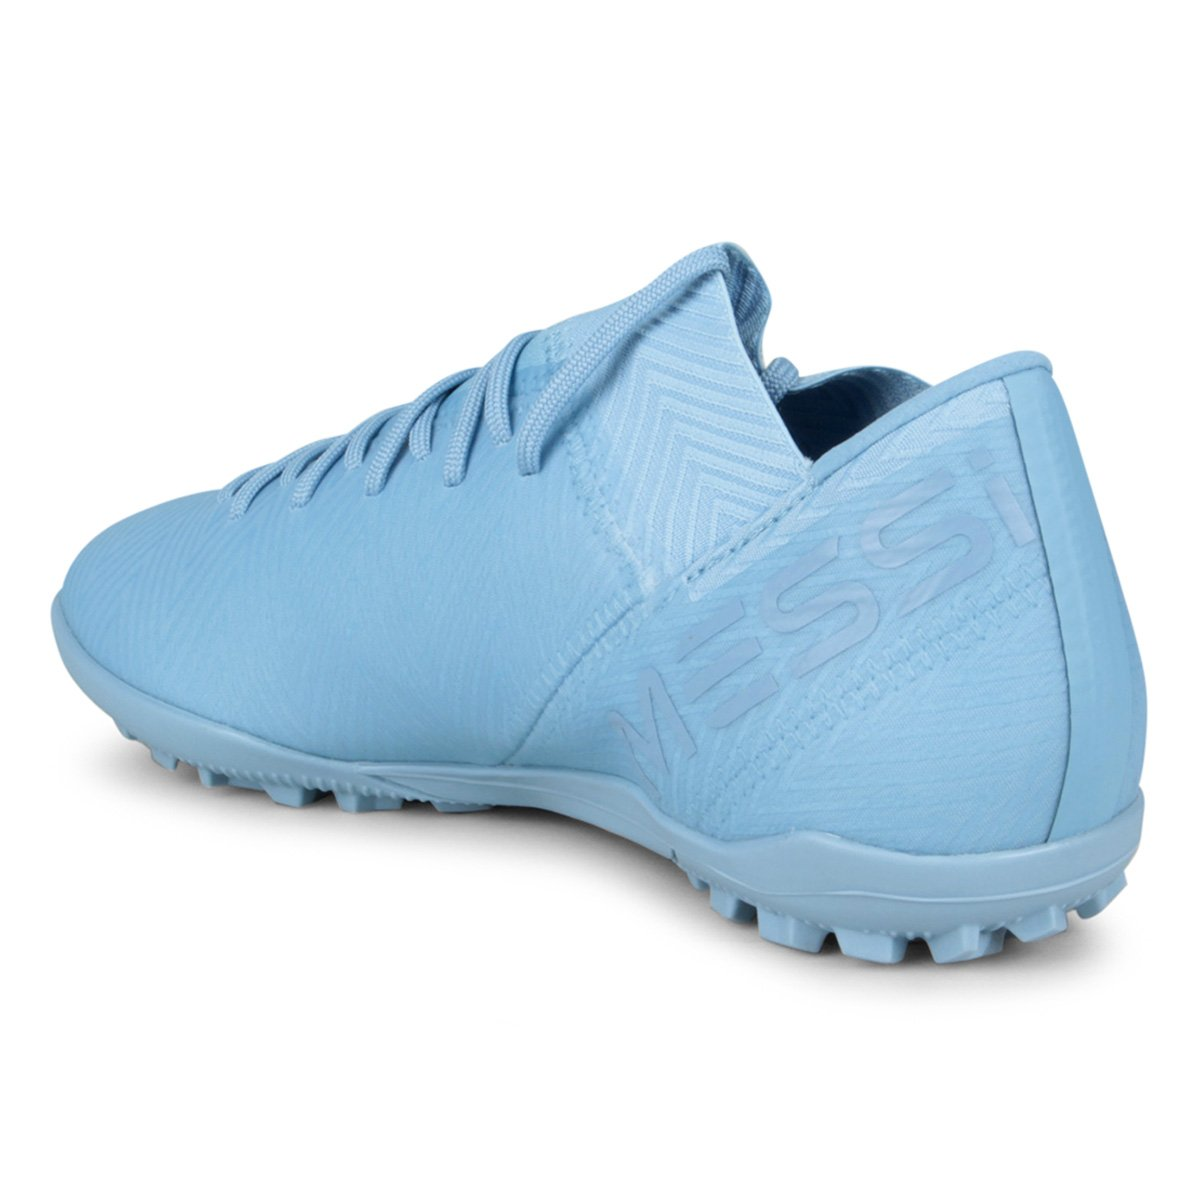 471962f3bc Chuteira Society Adidas Nemeziz Messi Tan 18 3 TF - Azul e Preto ...